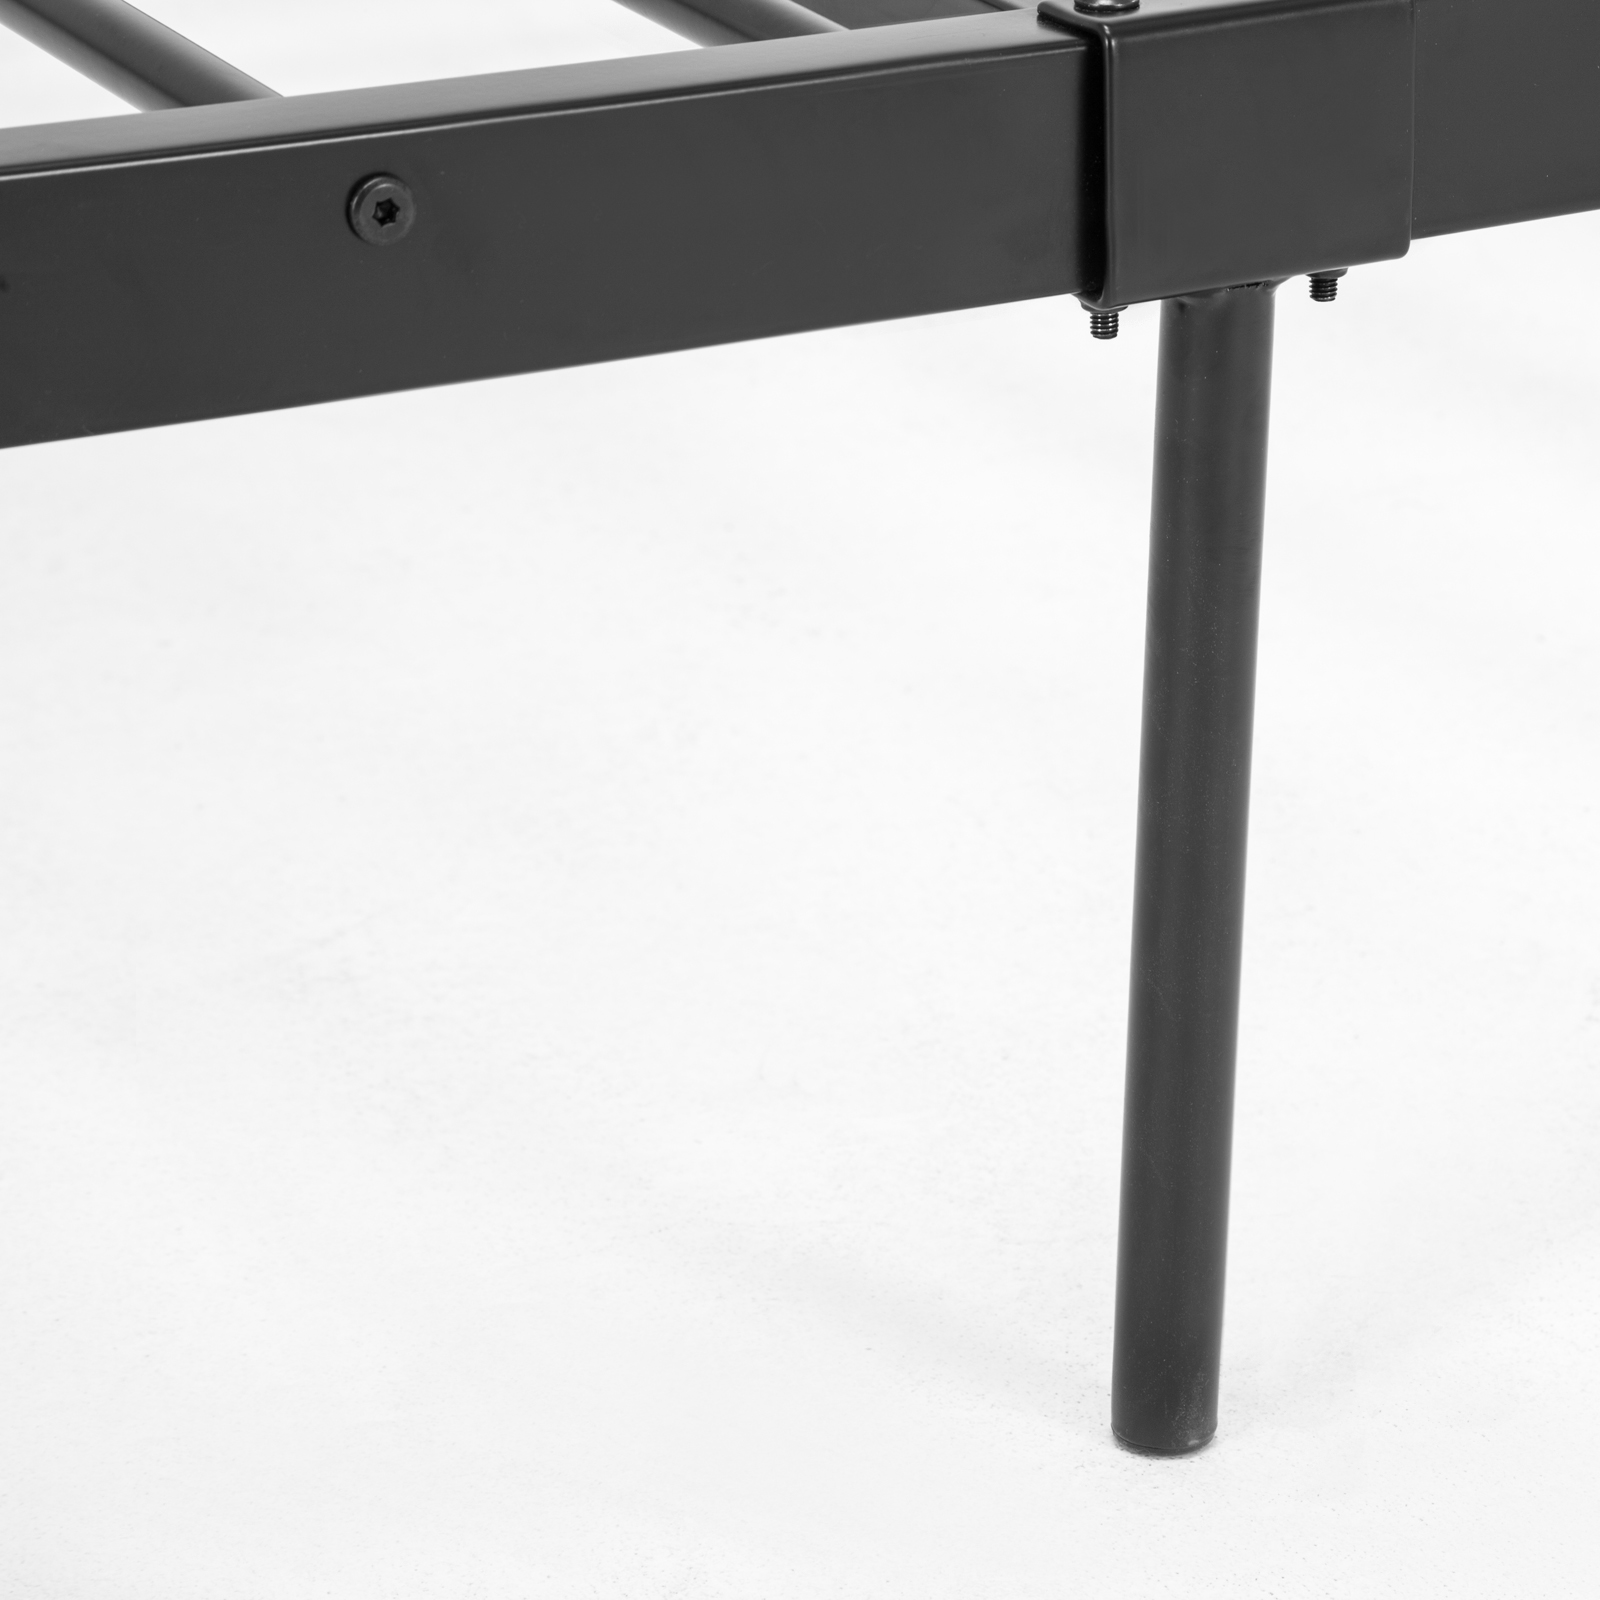 metal bed frame wood slats mattress platform heavy duty foun